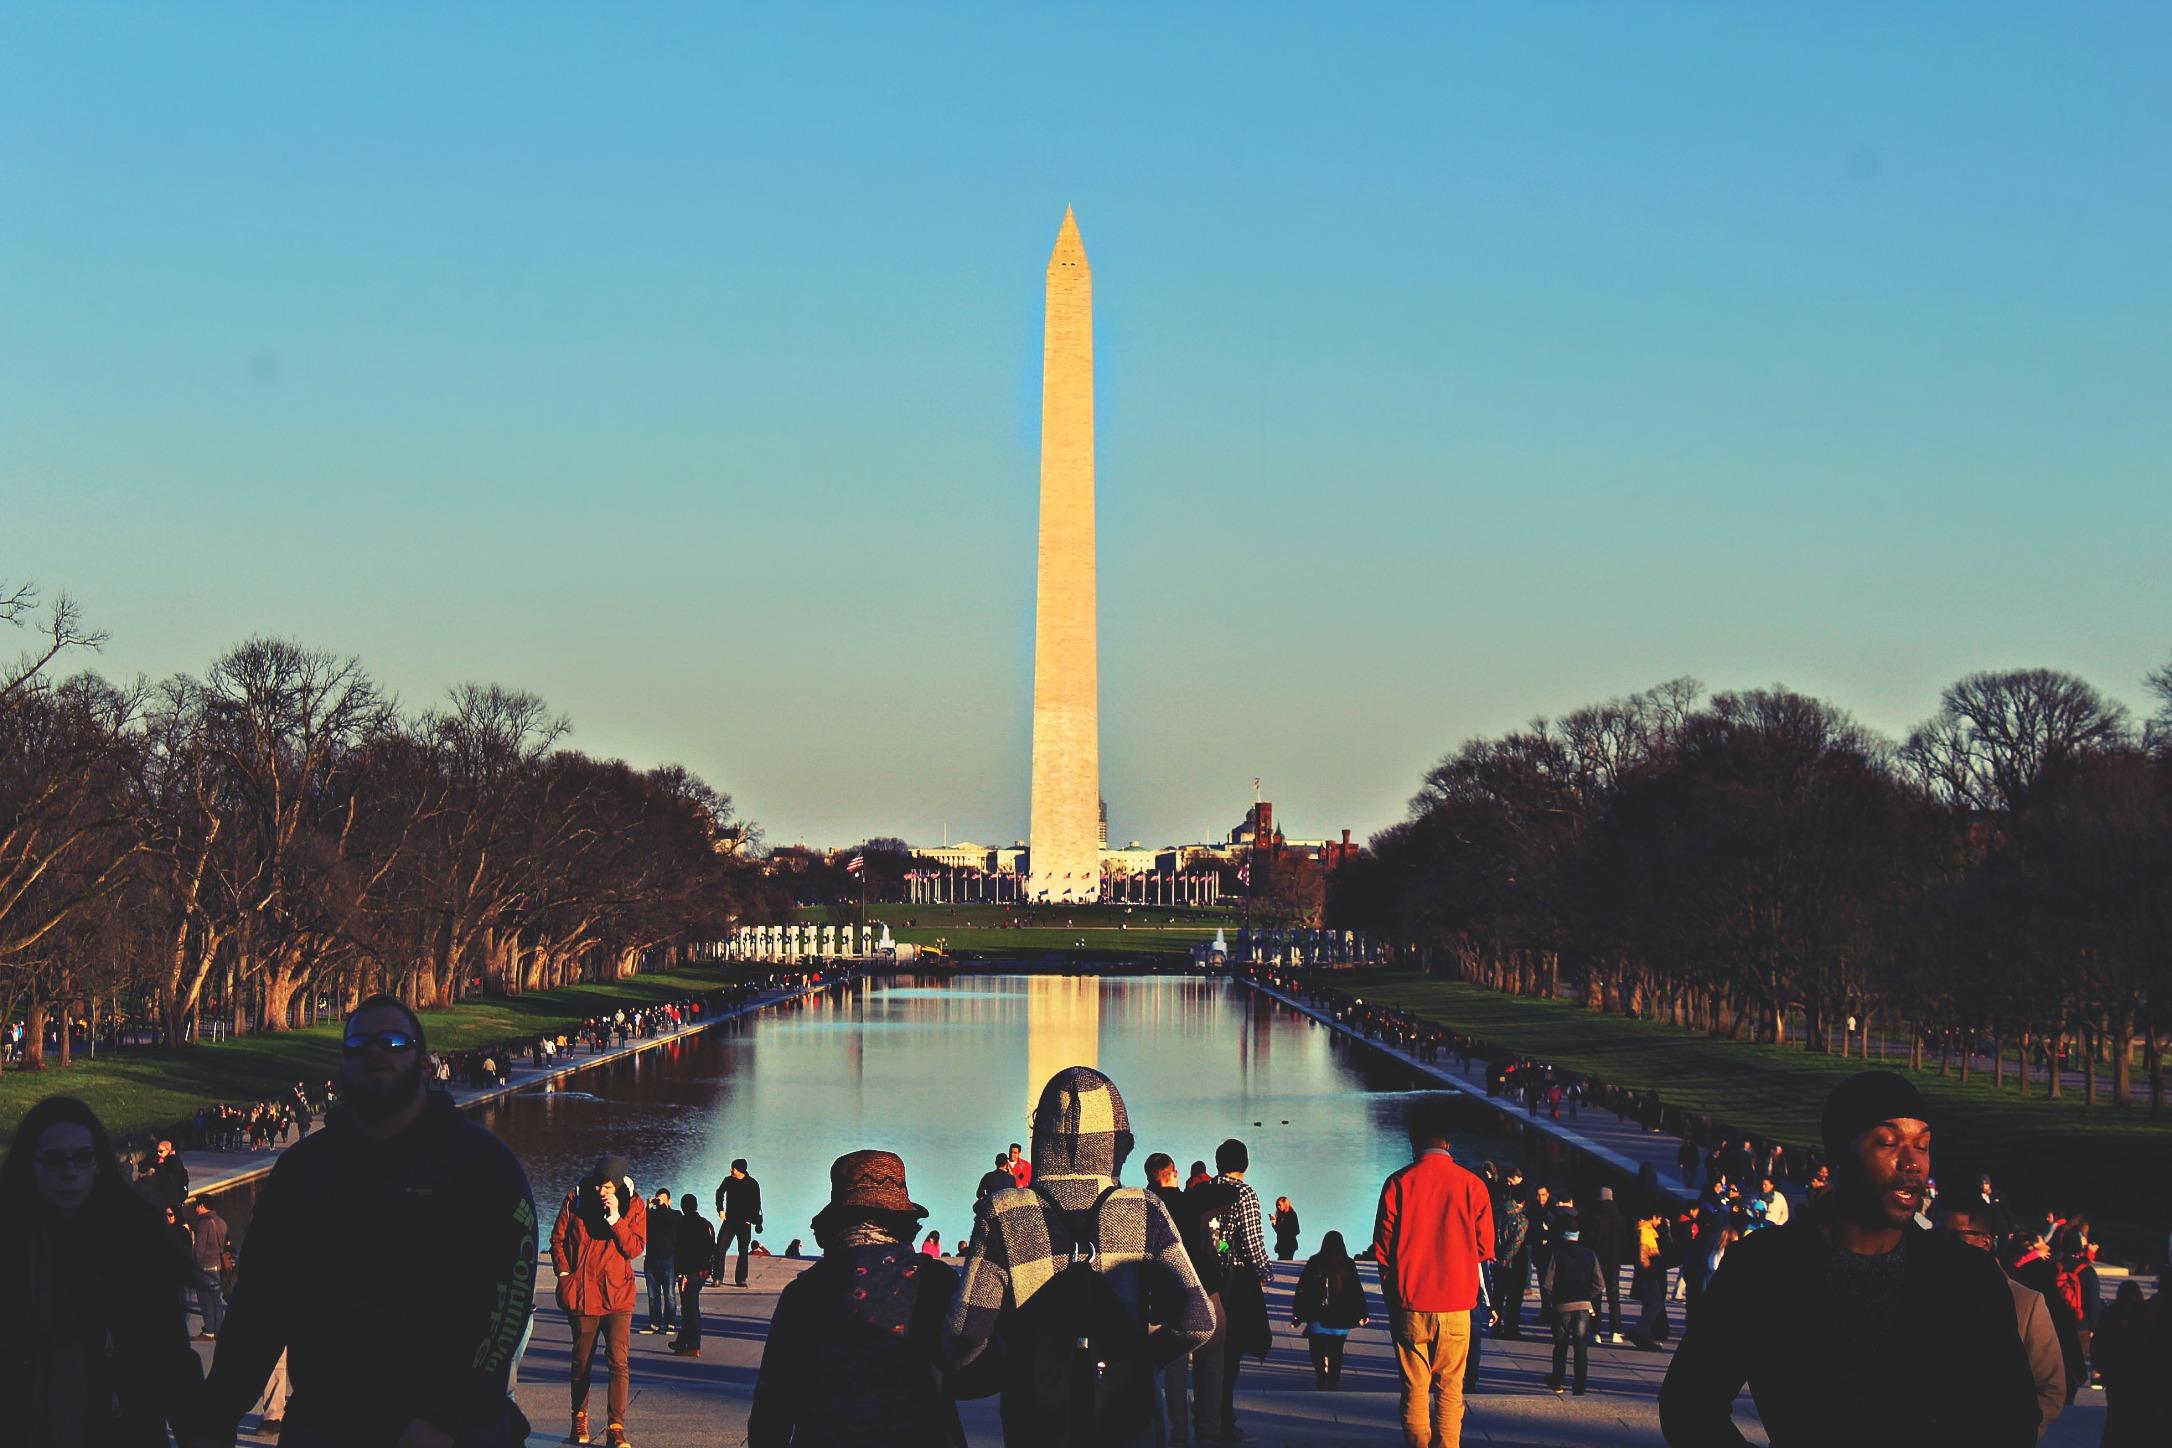 Exploring Monuments Washington D.C.